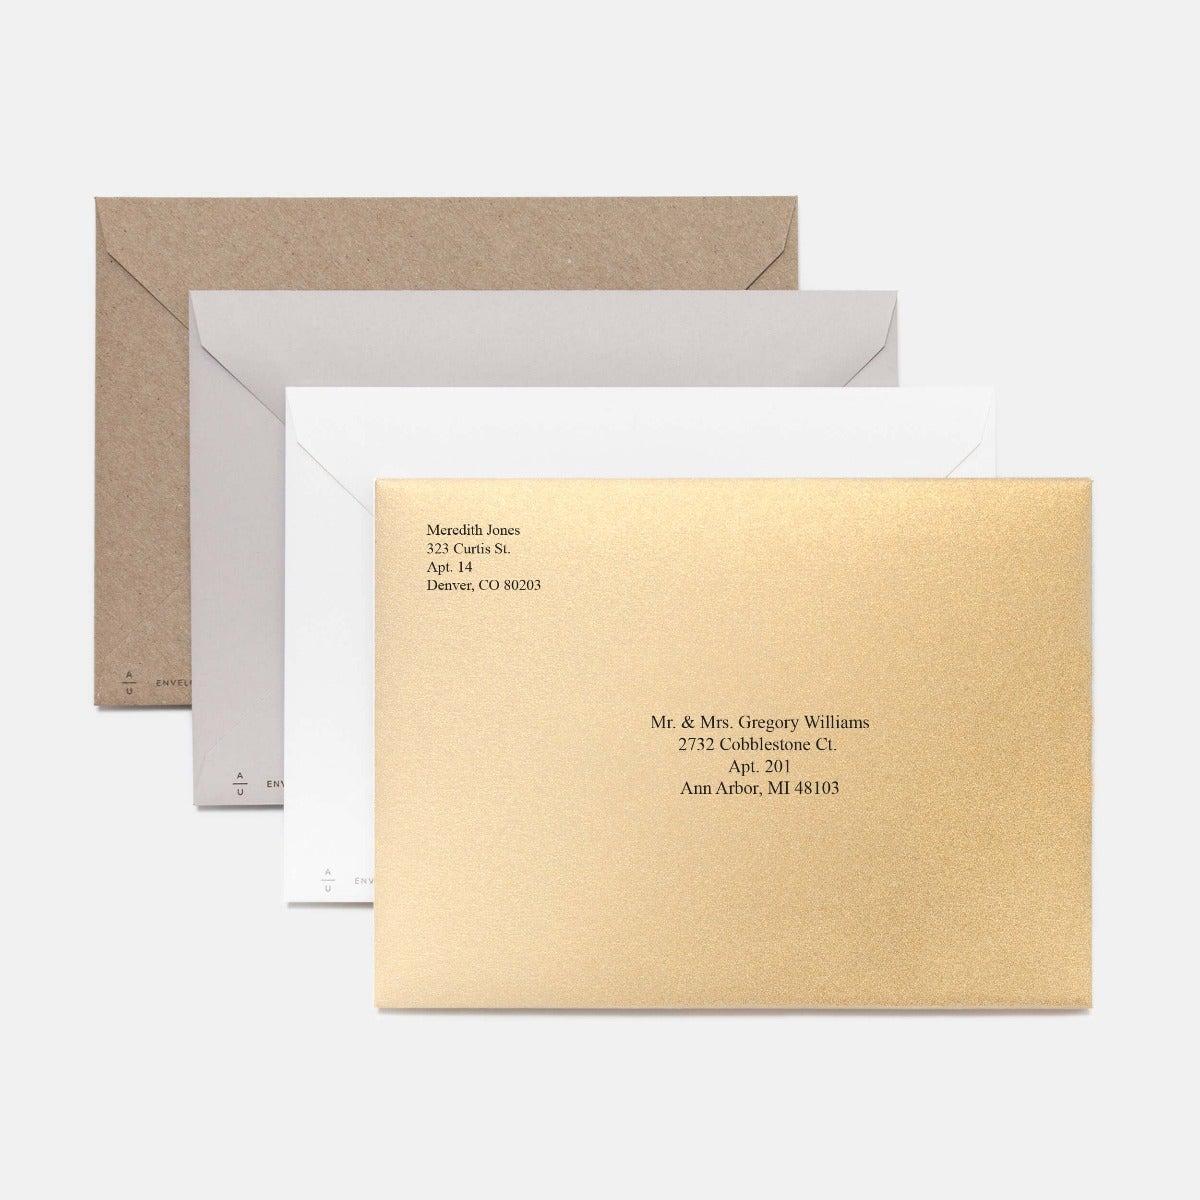 Simplest Things Card